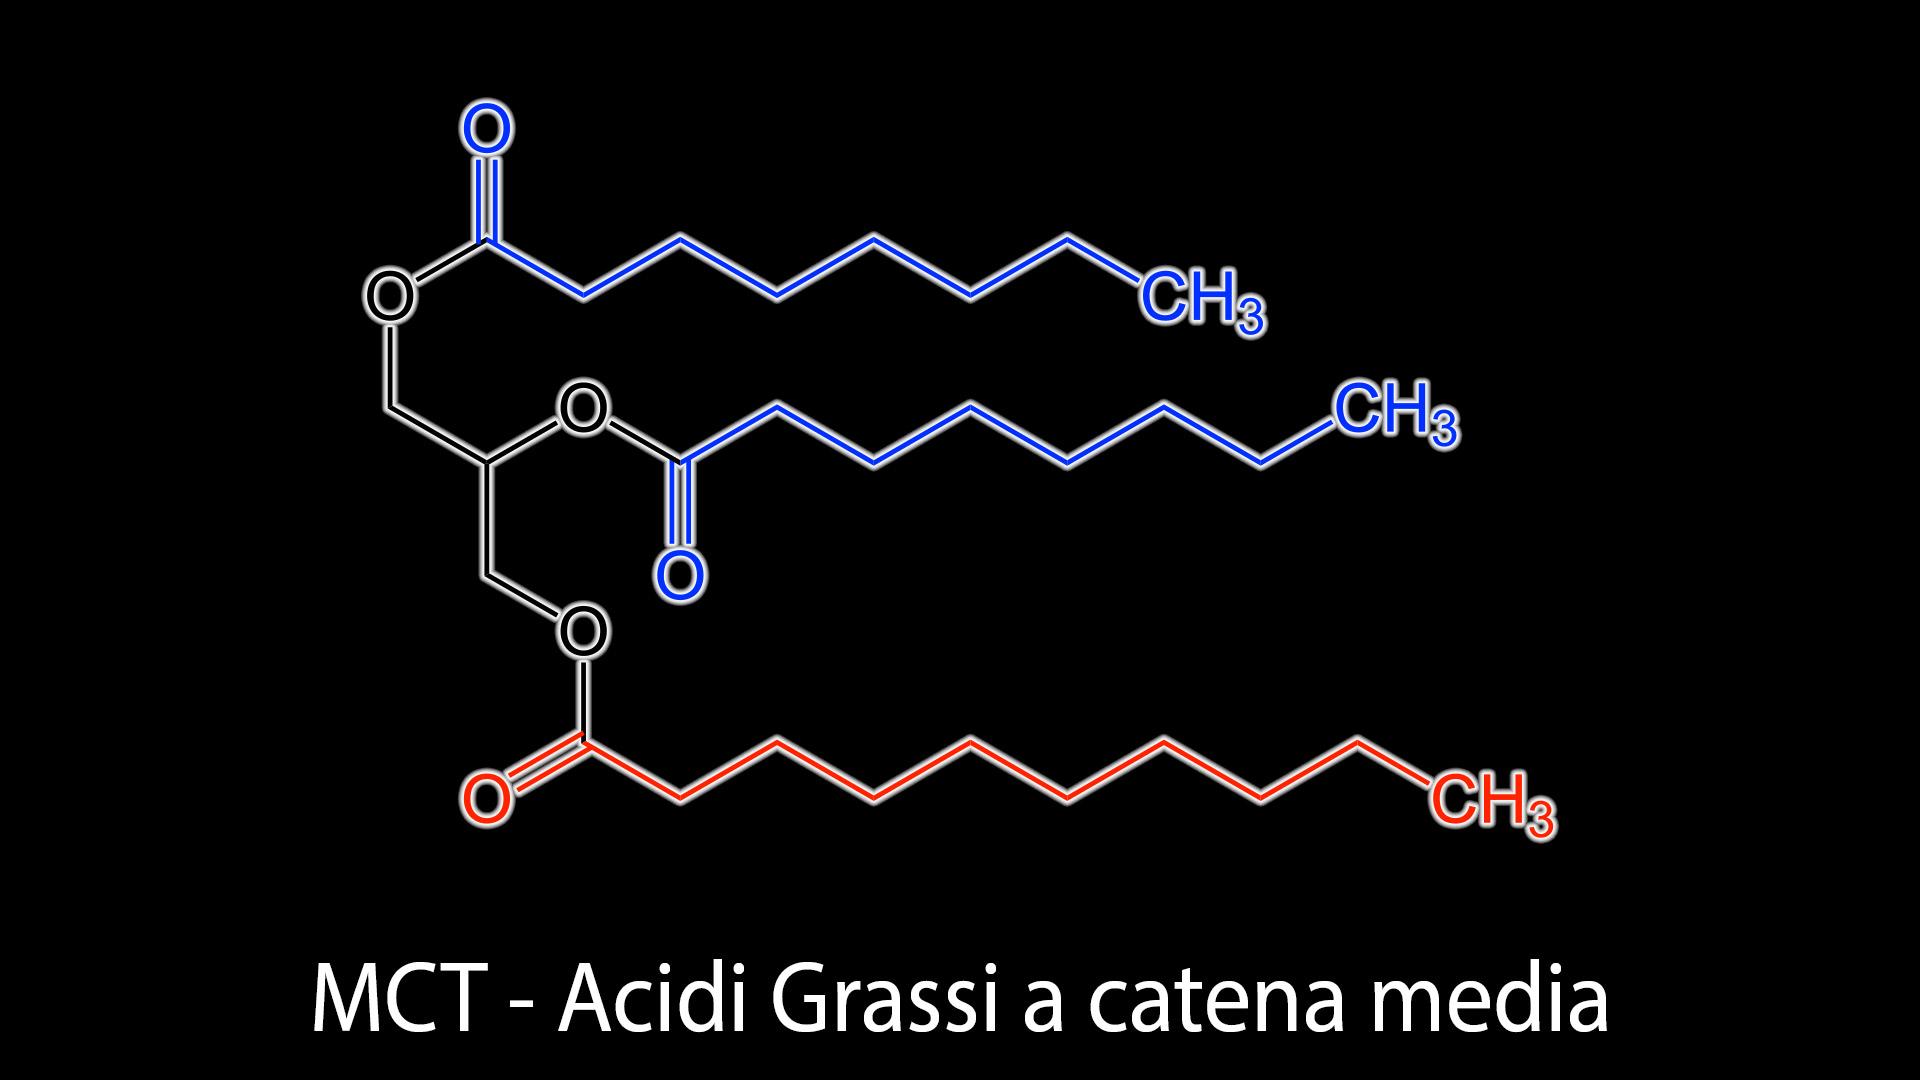 MCT Acidi grassi a catena media